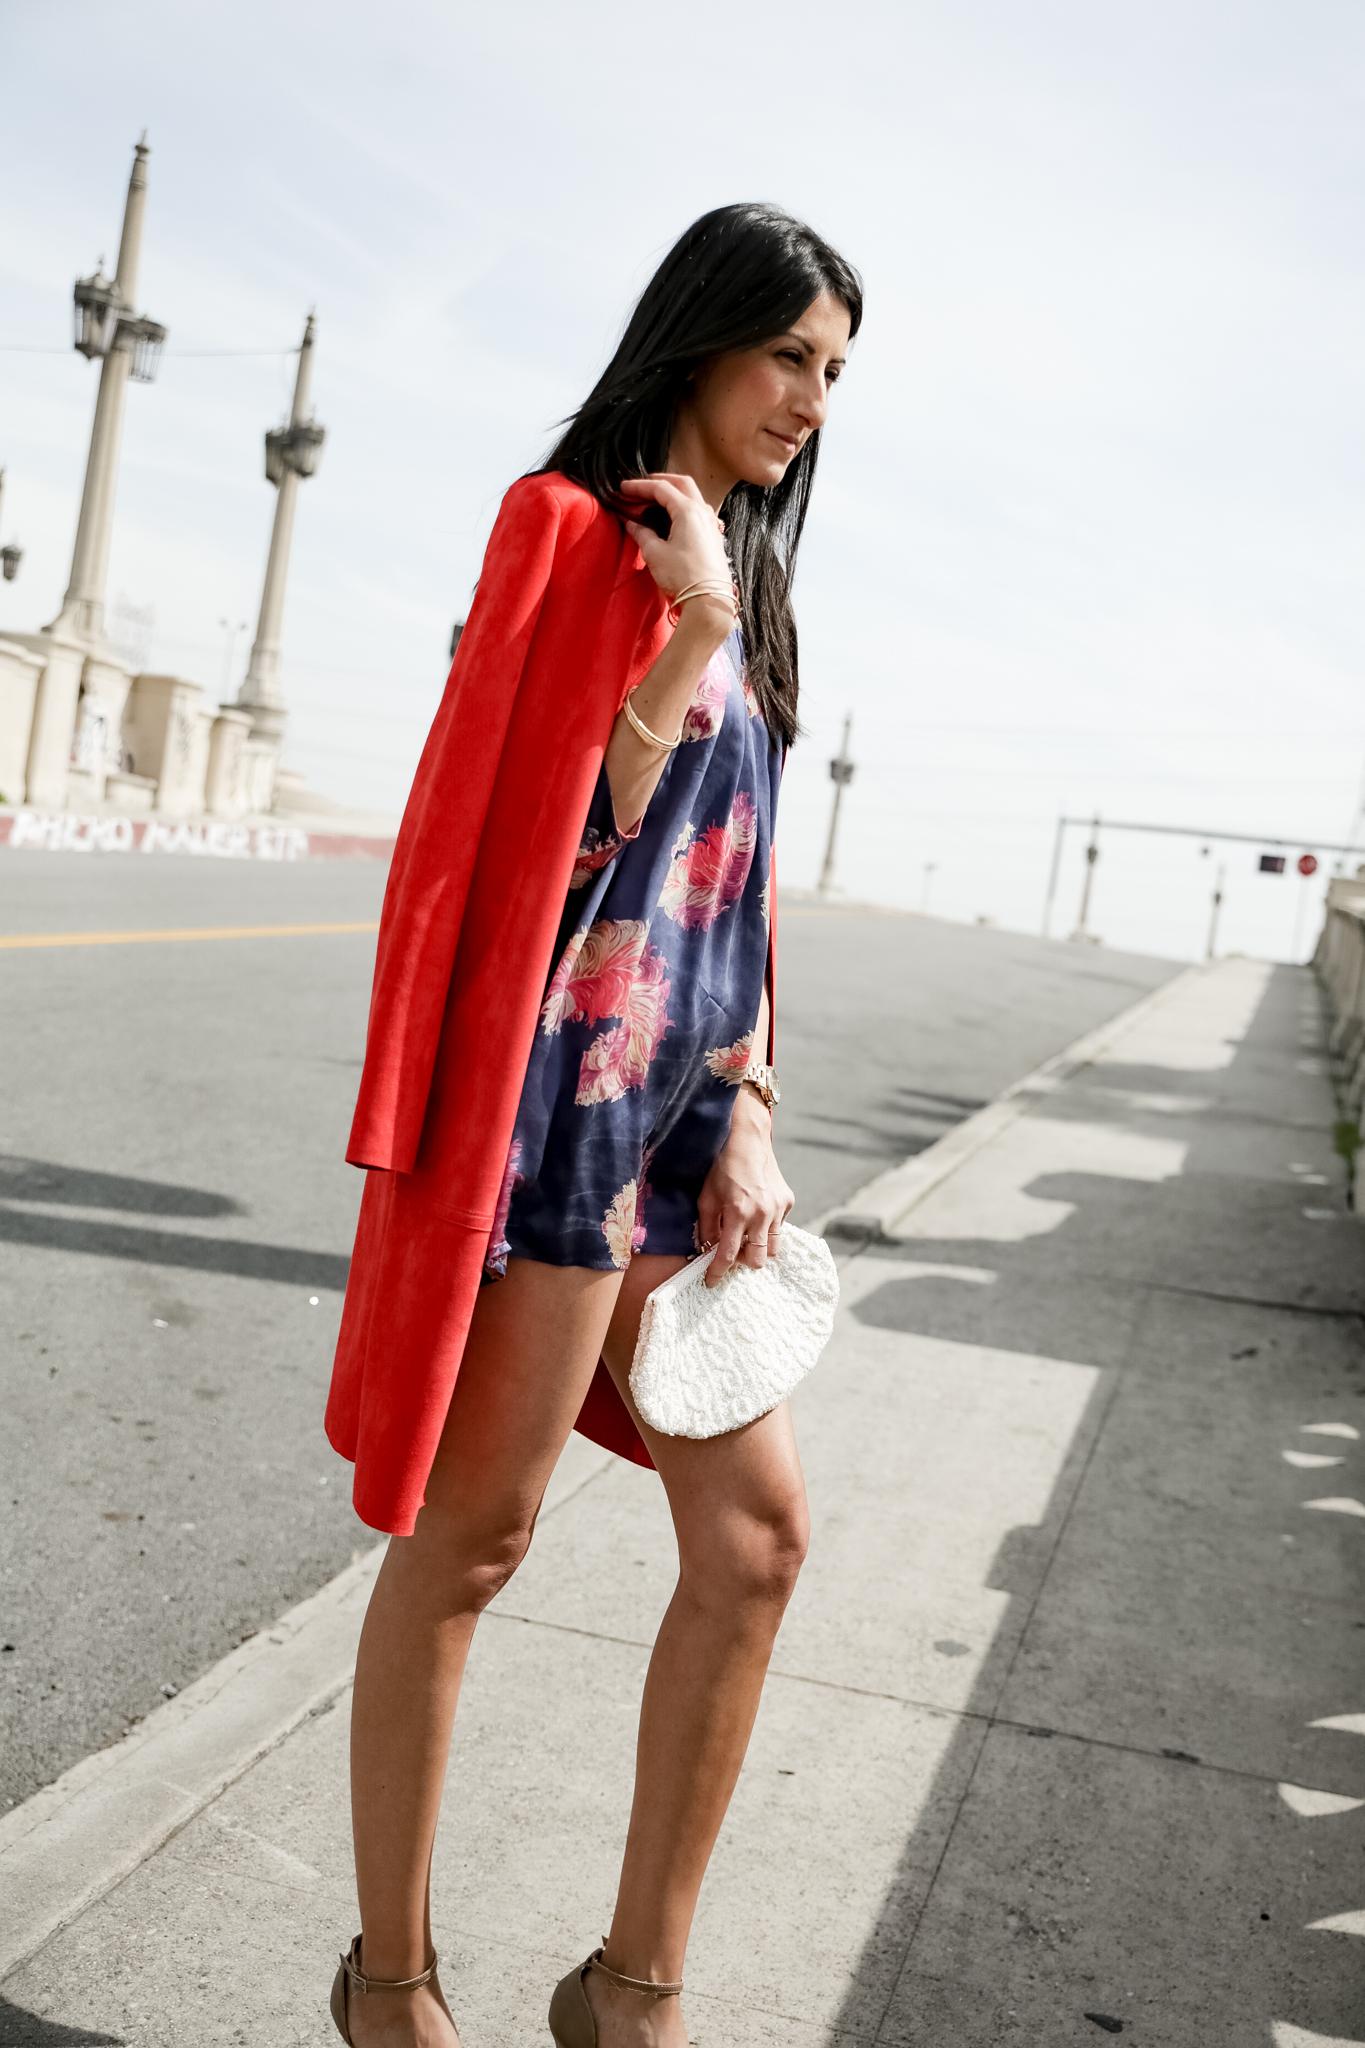 night option - Slate Farylrobin for Free People vegan heels, Vanitas mini dress, vintage beaded clutch, jewels